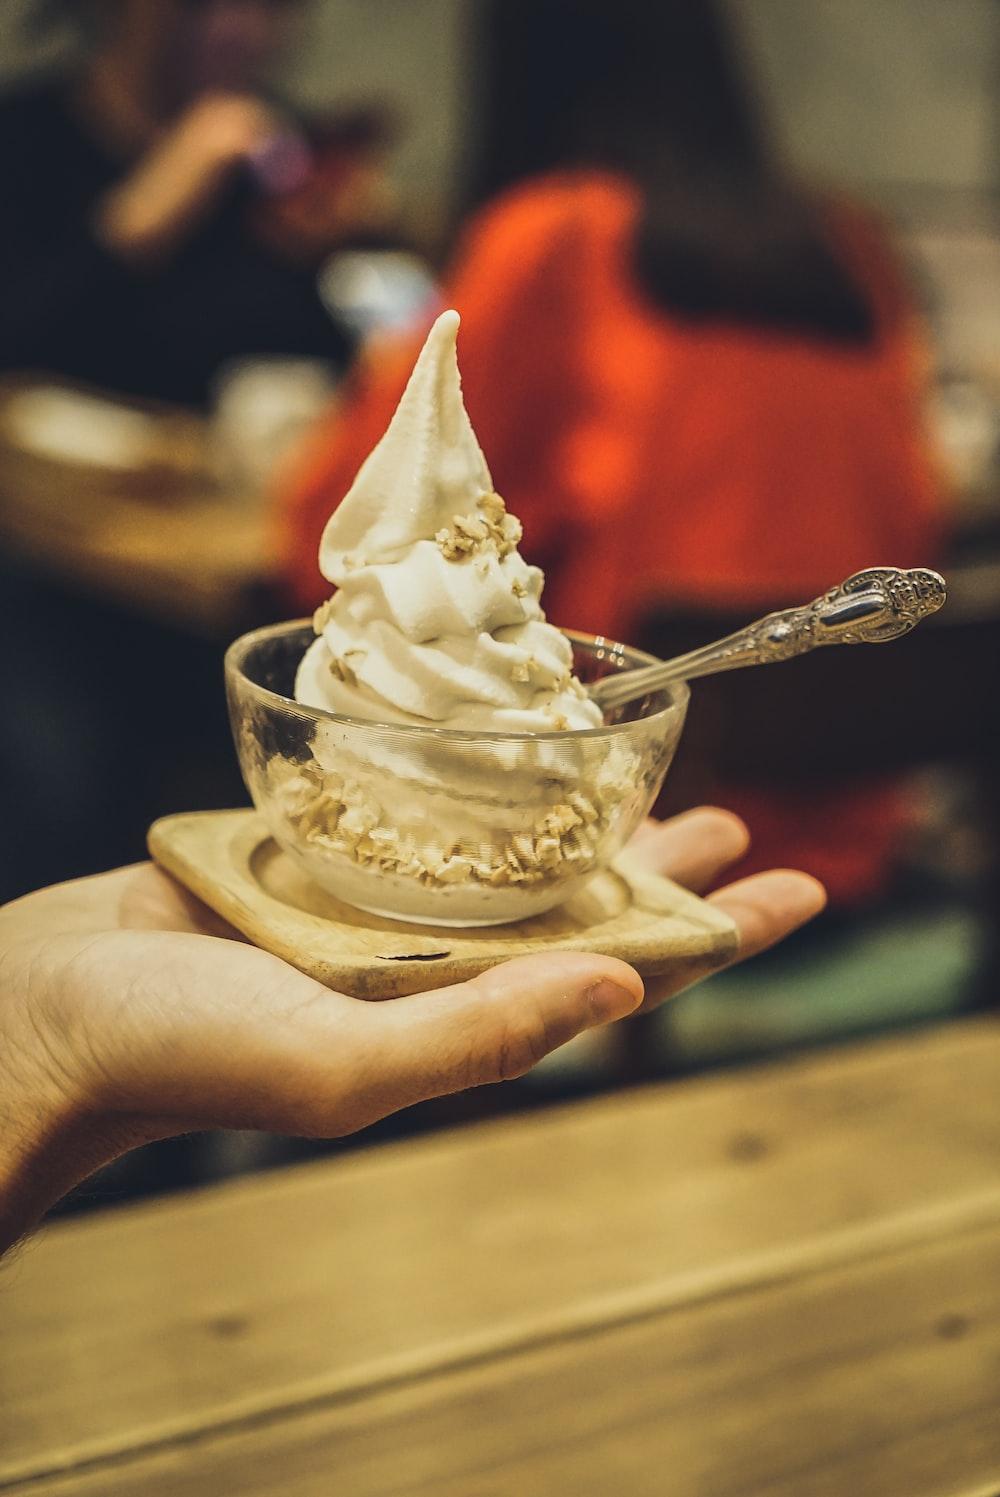 selective focus photography of ice cream